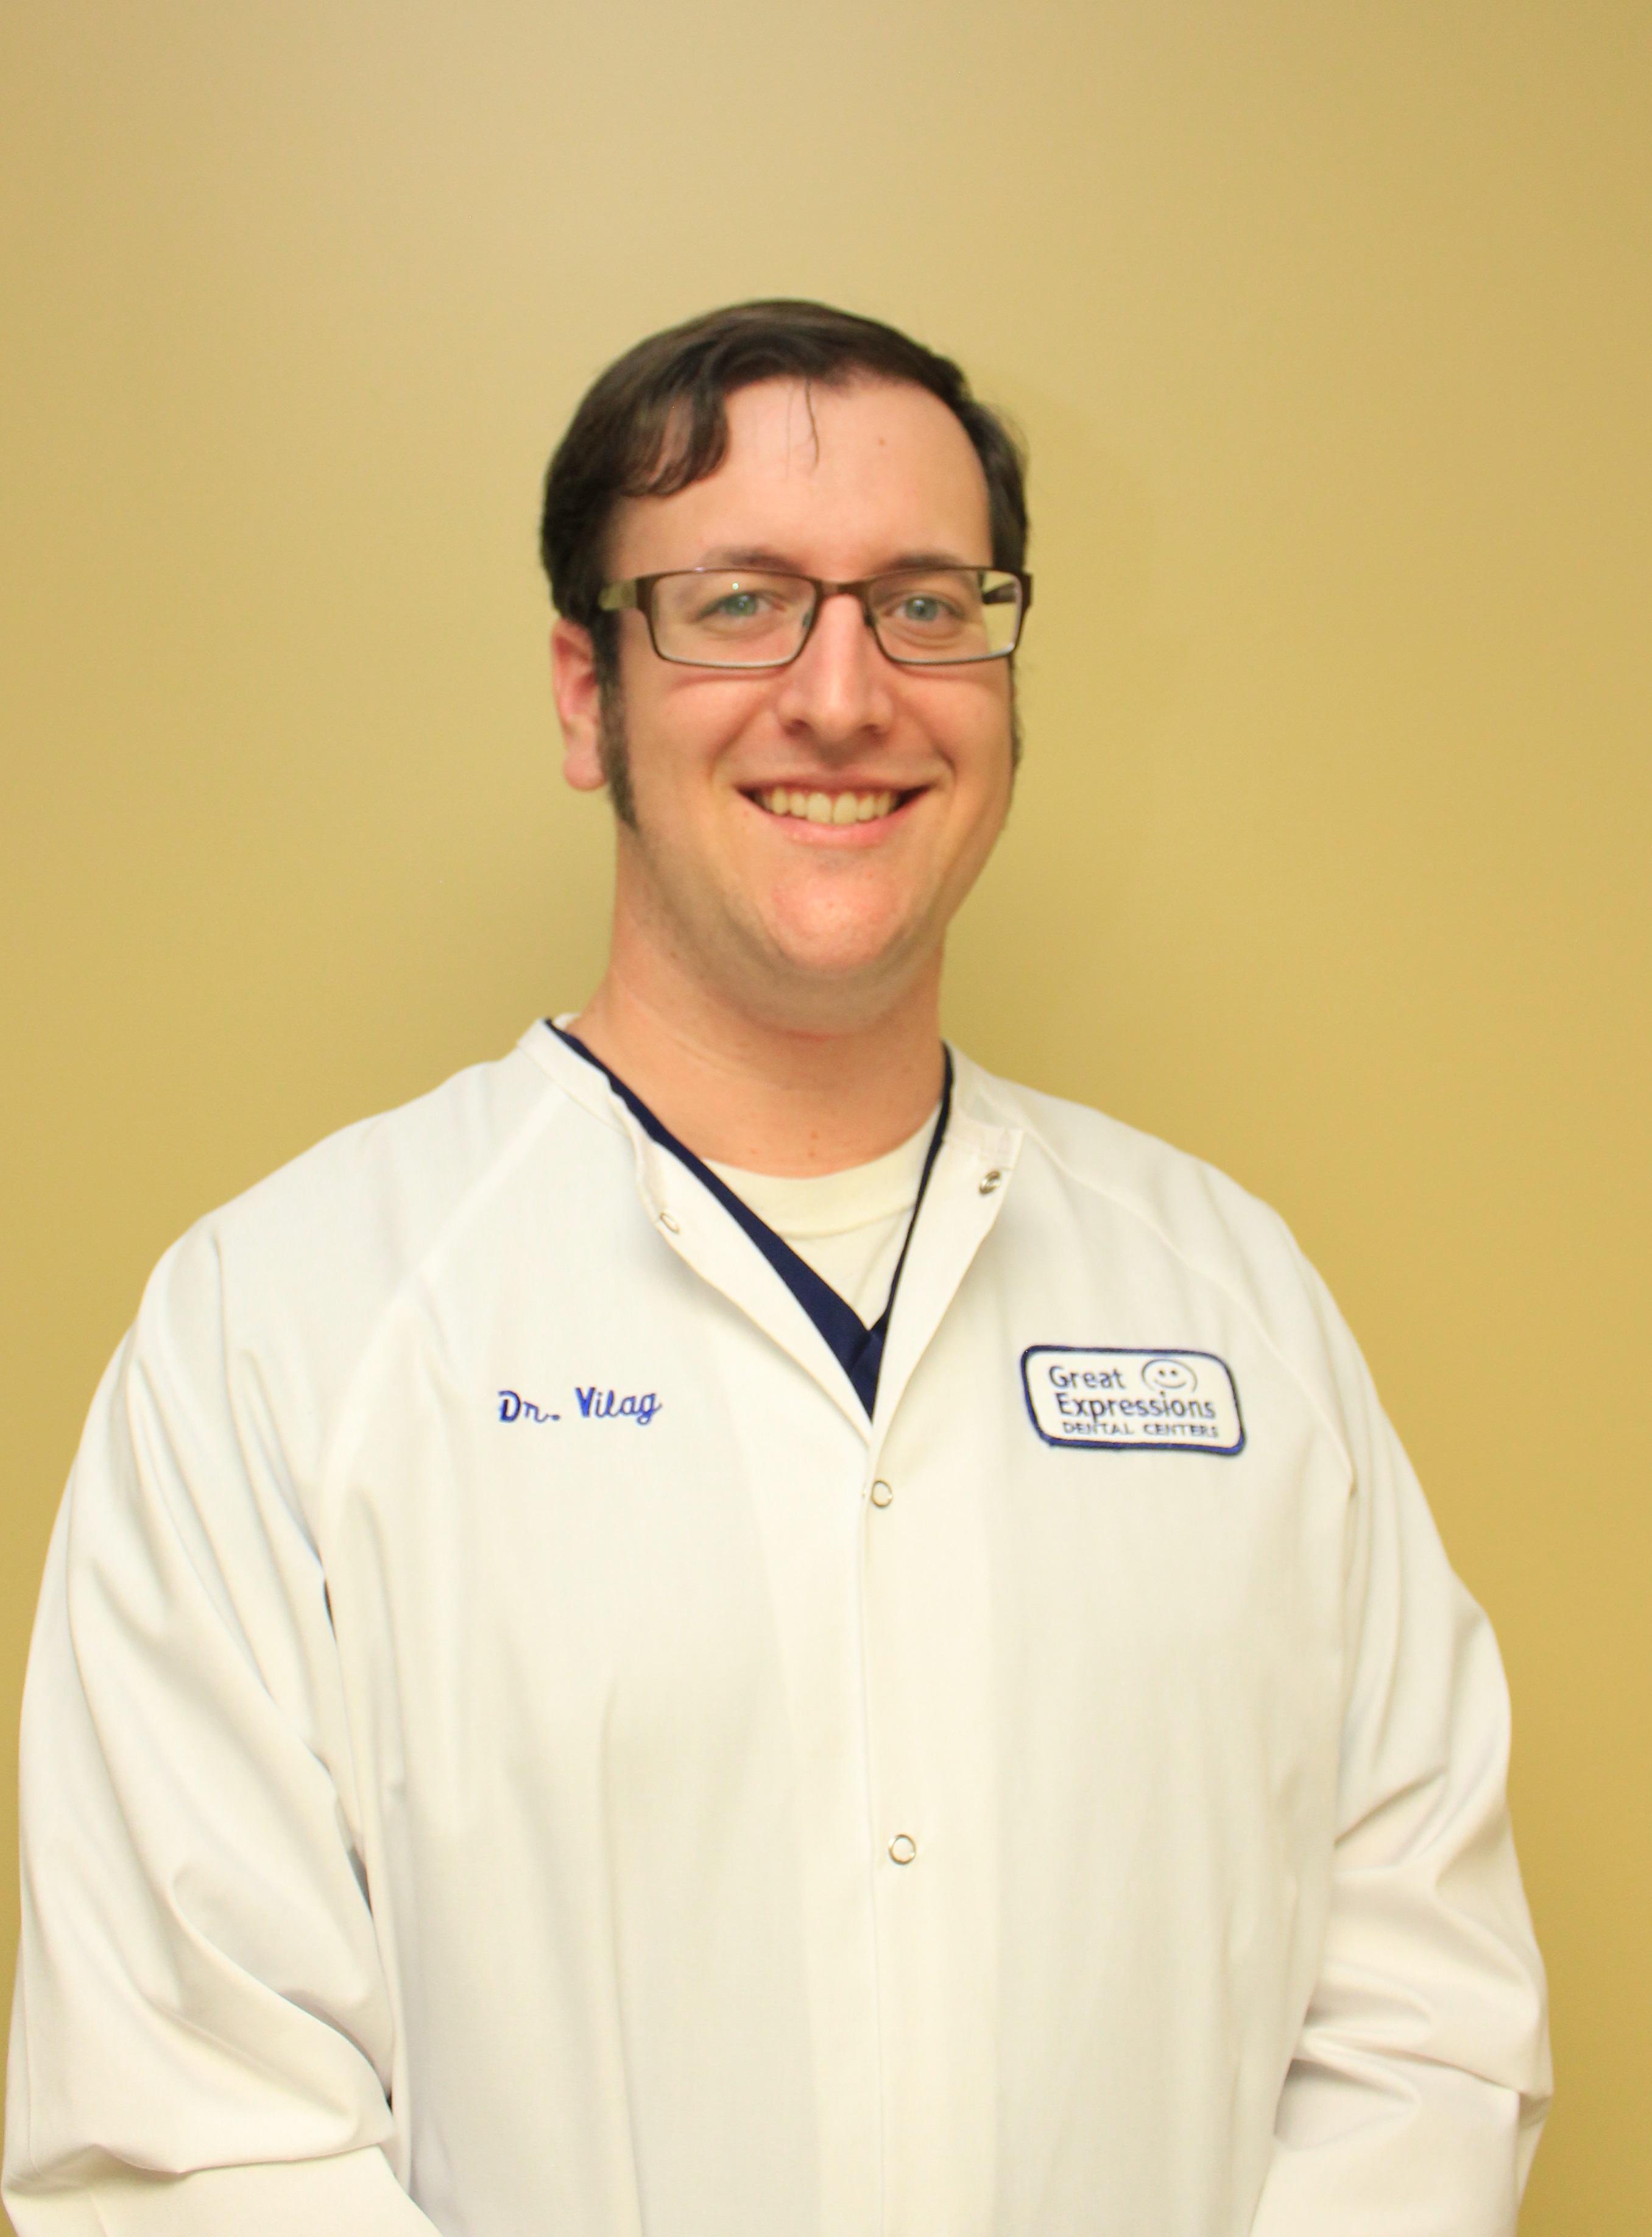 Dr. Vilag, a Great Expressions Dental Centers' dentist.